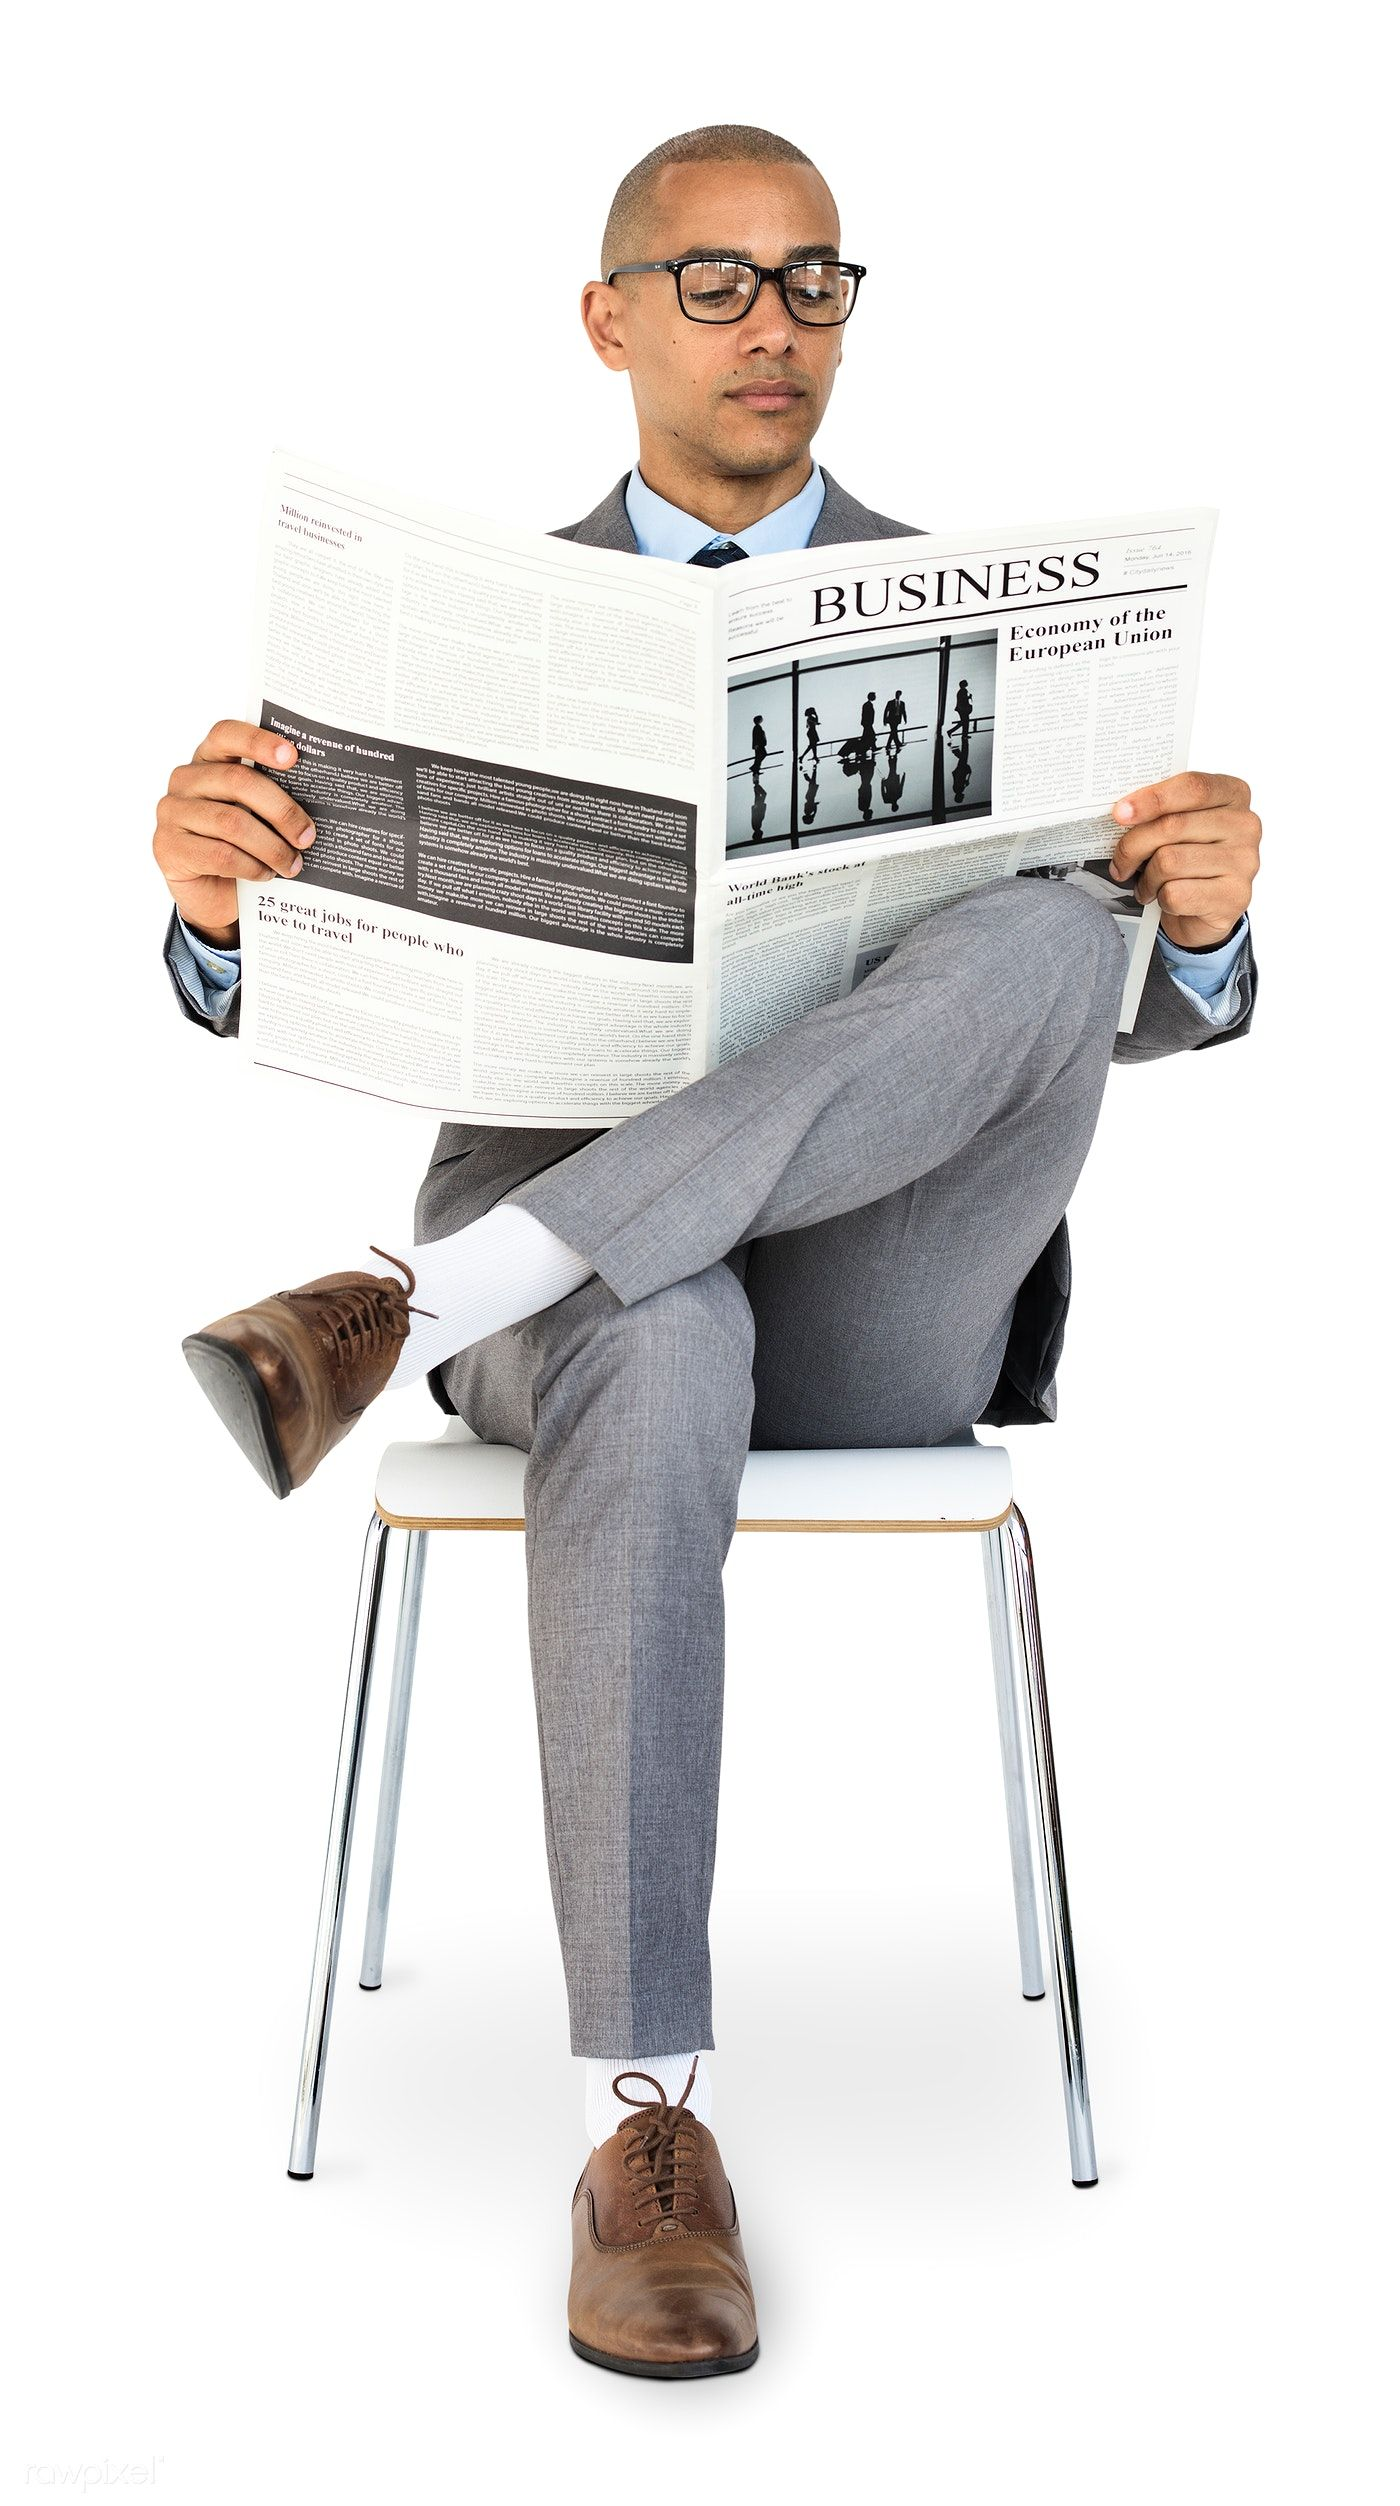 Download Premium Psd Of African Descent Business Man Reading Newspaper 4704 Business Man Photography Business Man Business Portrait